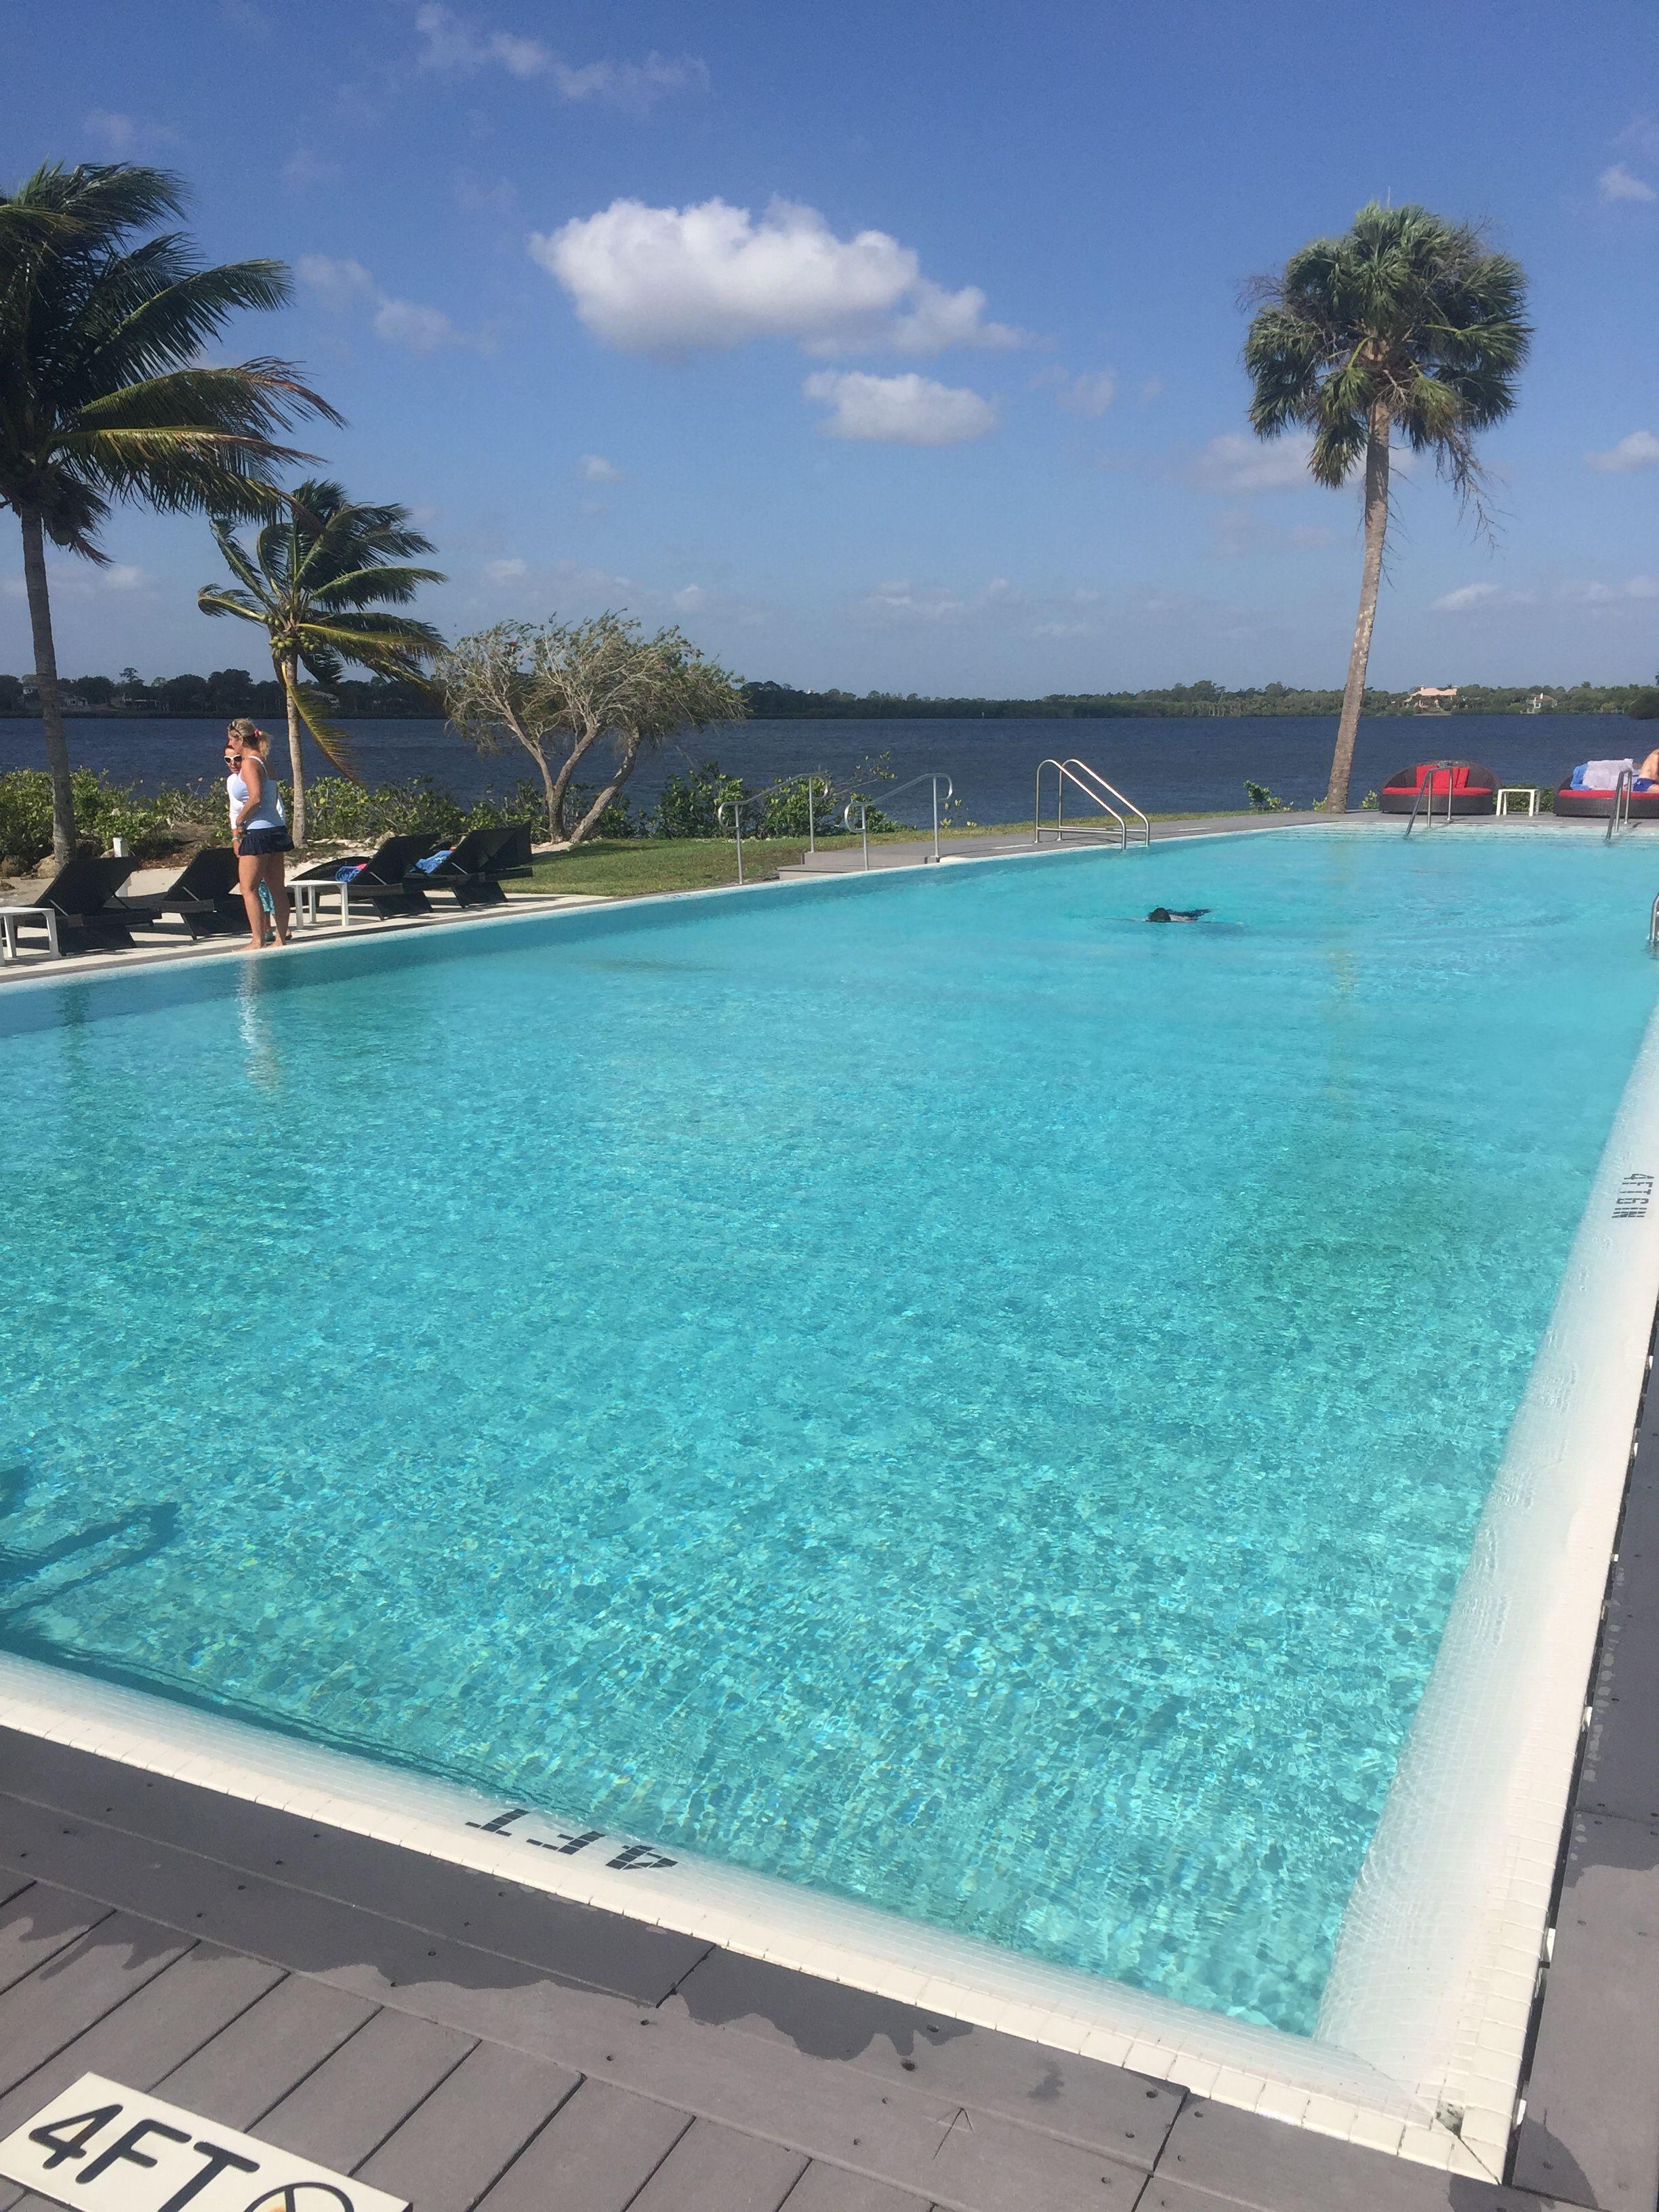 Pin On Club Med Sandpiper Bay Port St Lucie Florida April 2017